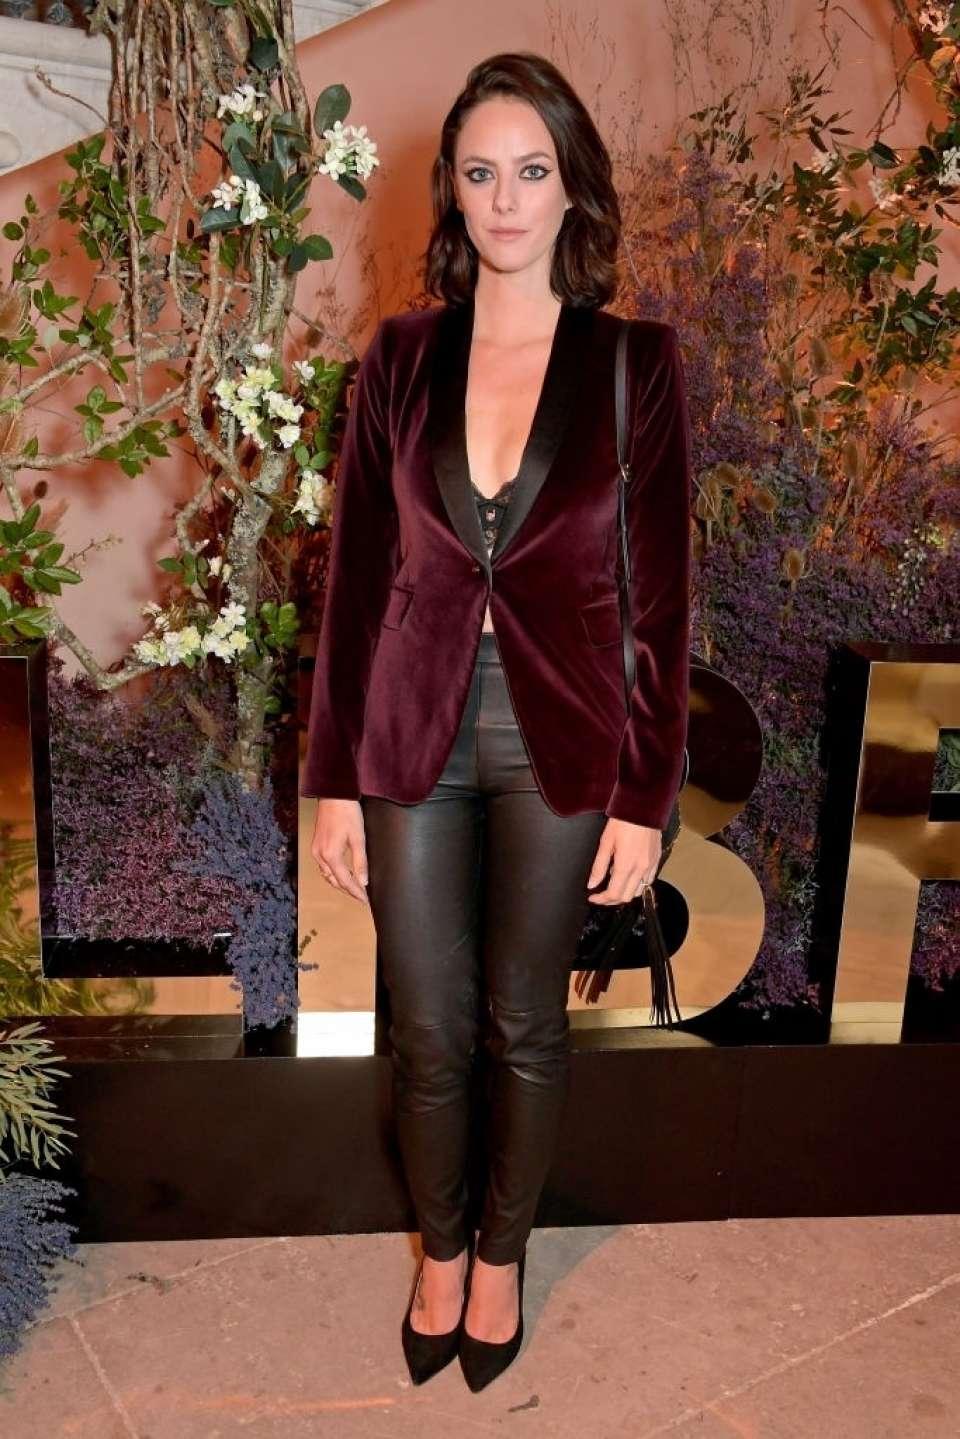 Kaya Scodelario - YSL New Fragrance 'Libre' Launch Party in London